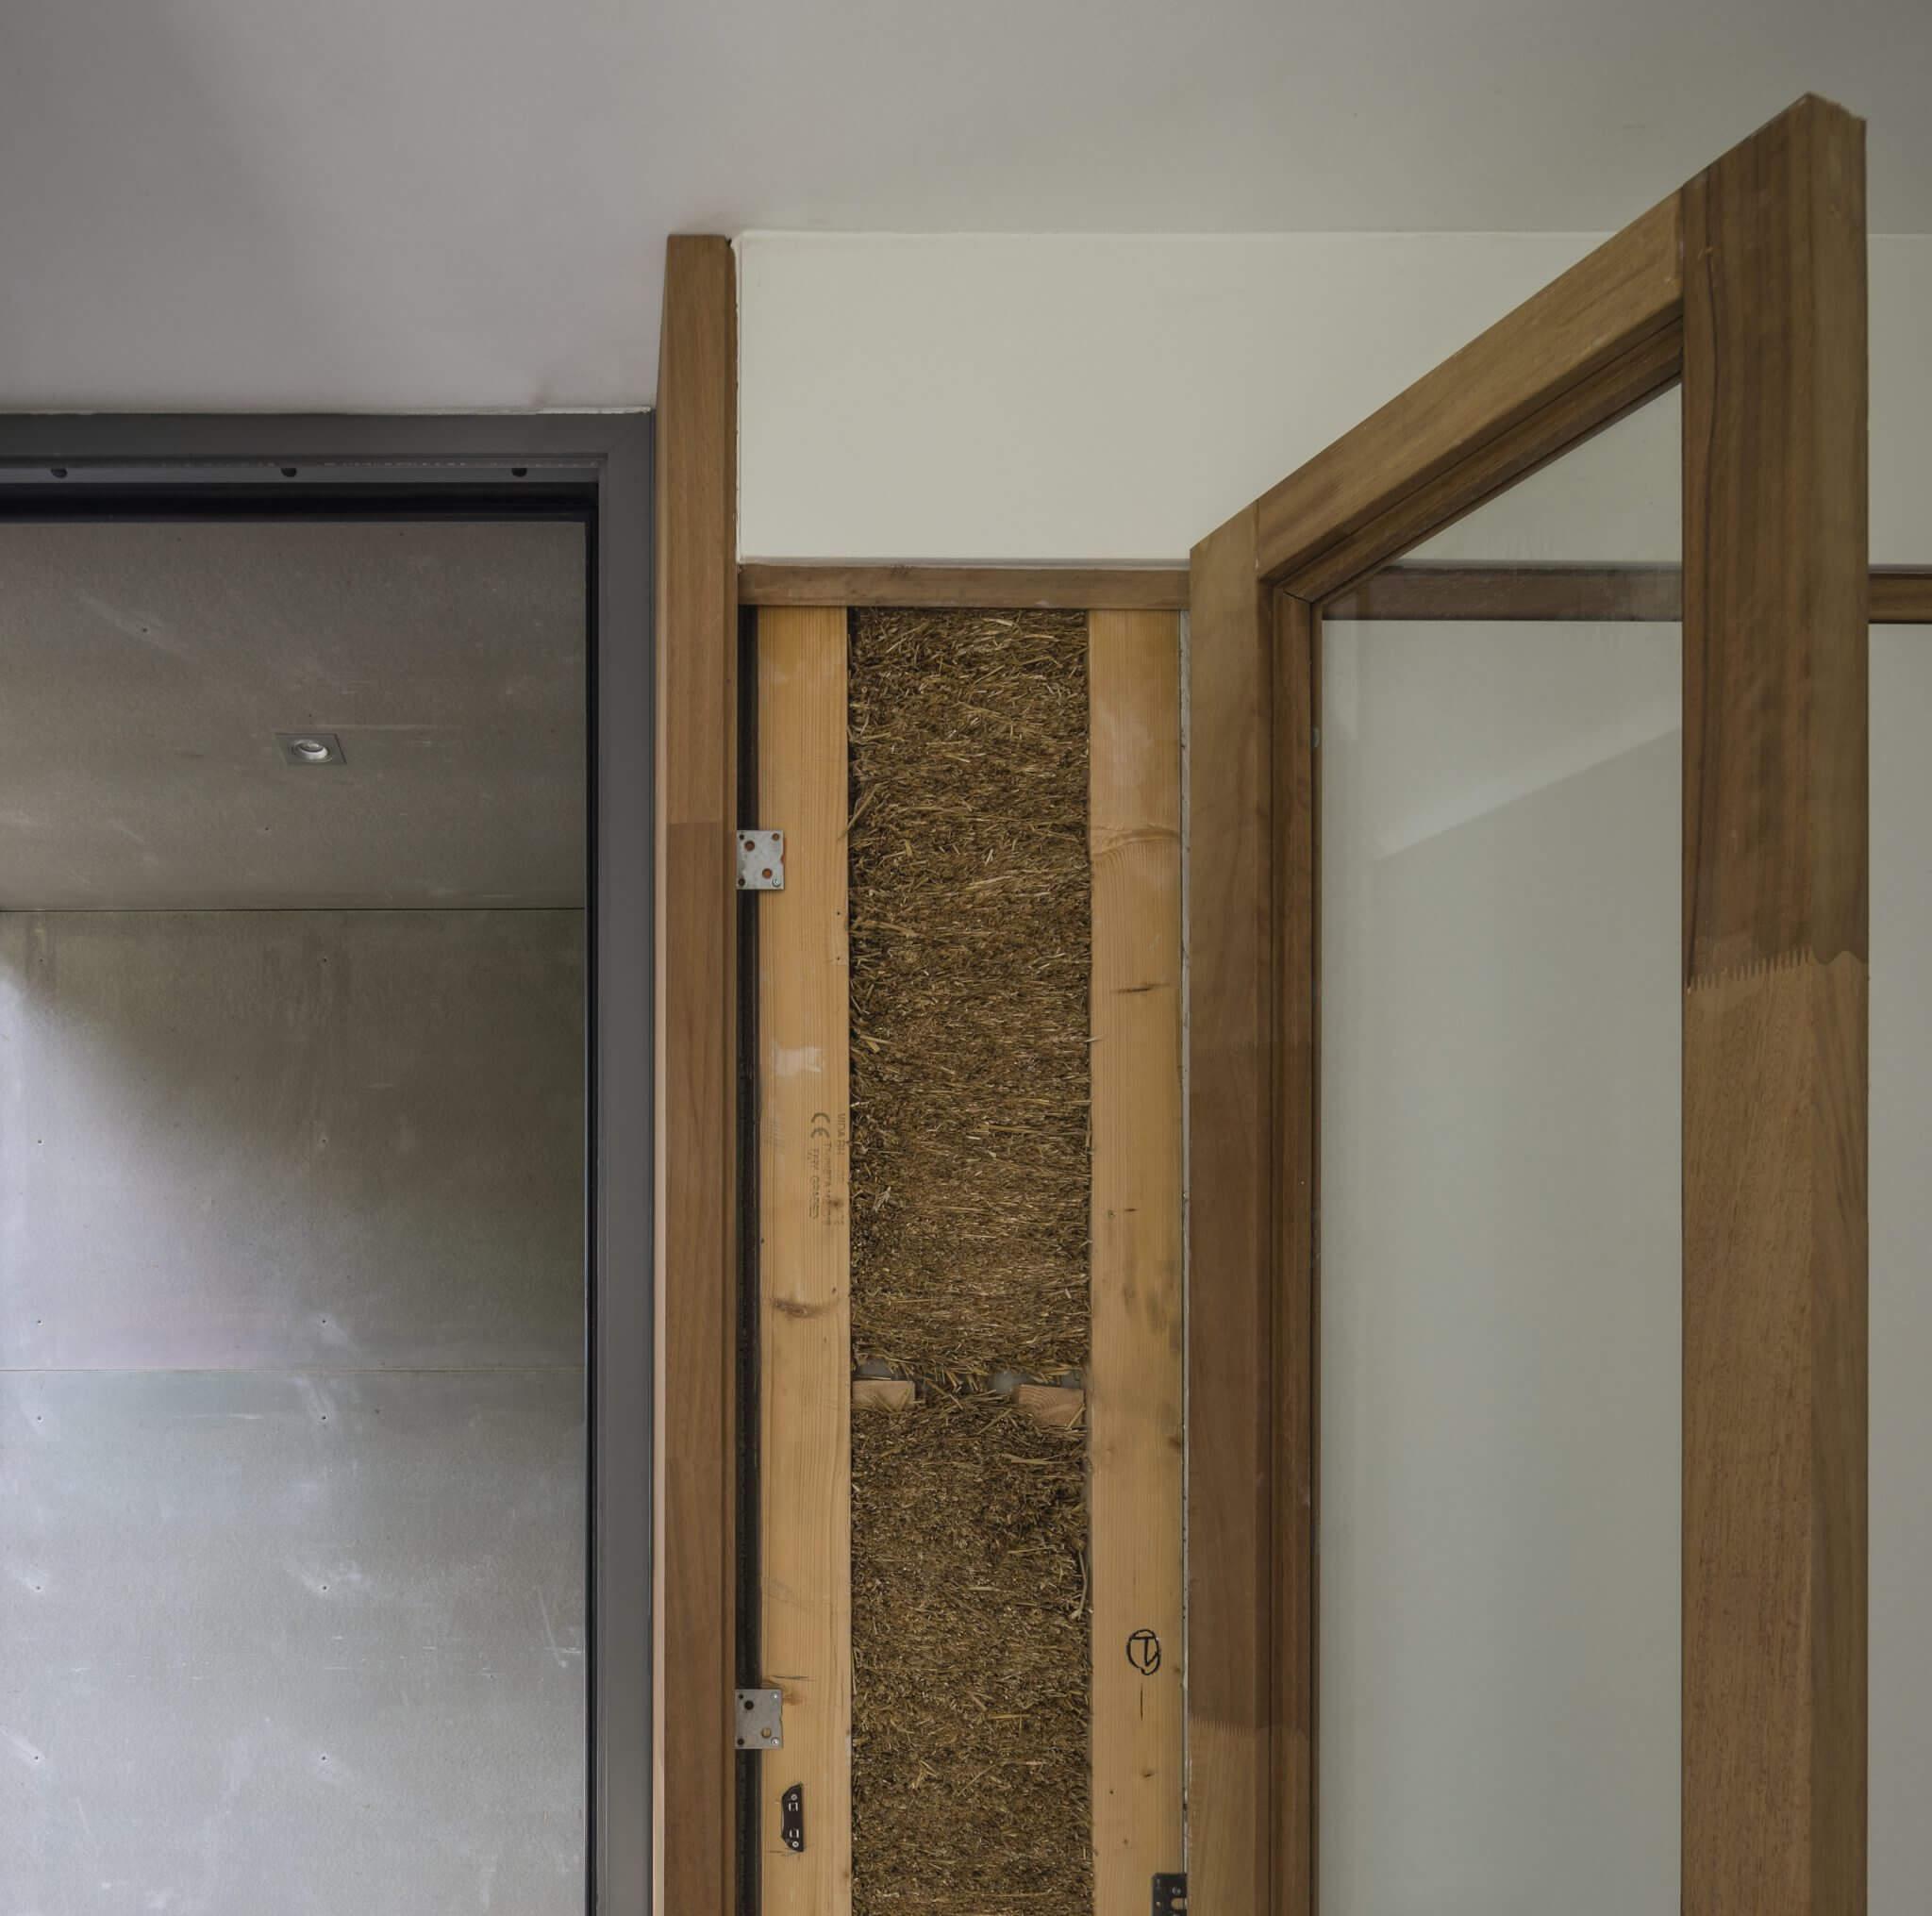 Eindhoven Brainport Strotec stro leem biobased stuc stucwerk hout weißenhofsiedlung isolatie circulair ecococon energieneutraal split-level licht villa CPO Philips Strijp Strijp-R binnenklimaat damp-open klimaat gezond energie zonnepanelen hoog plafond